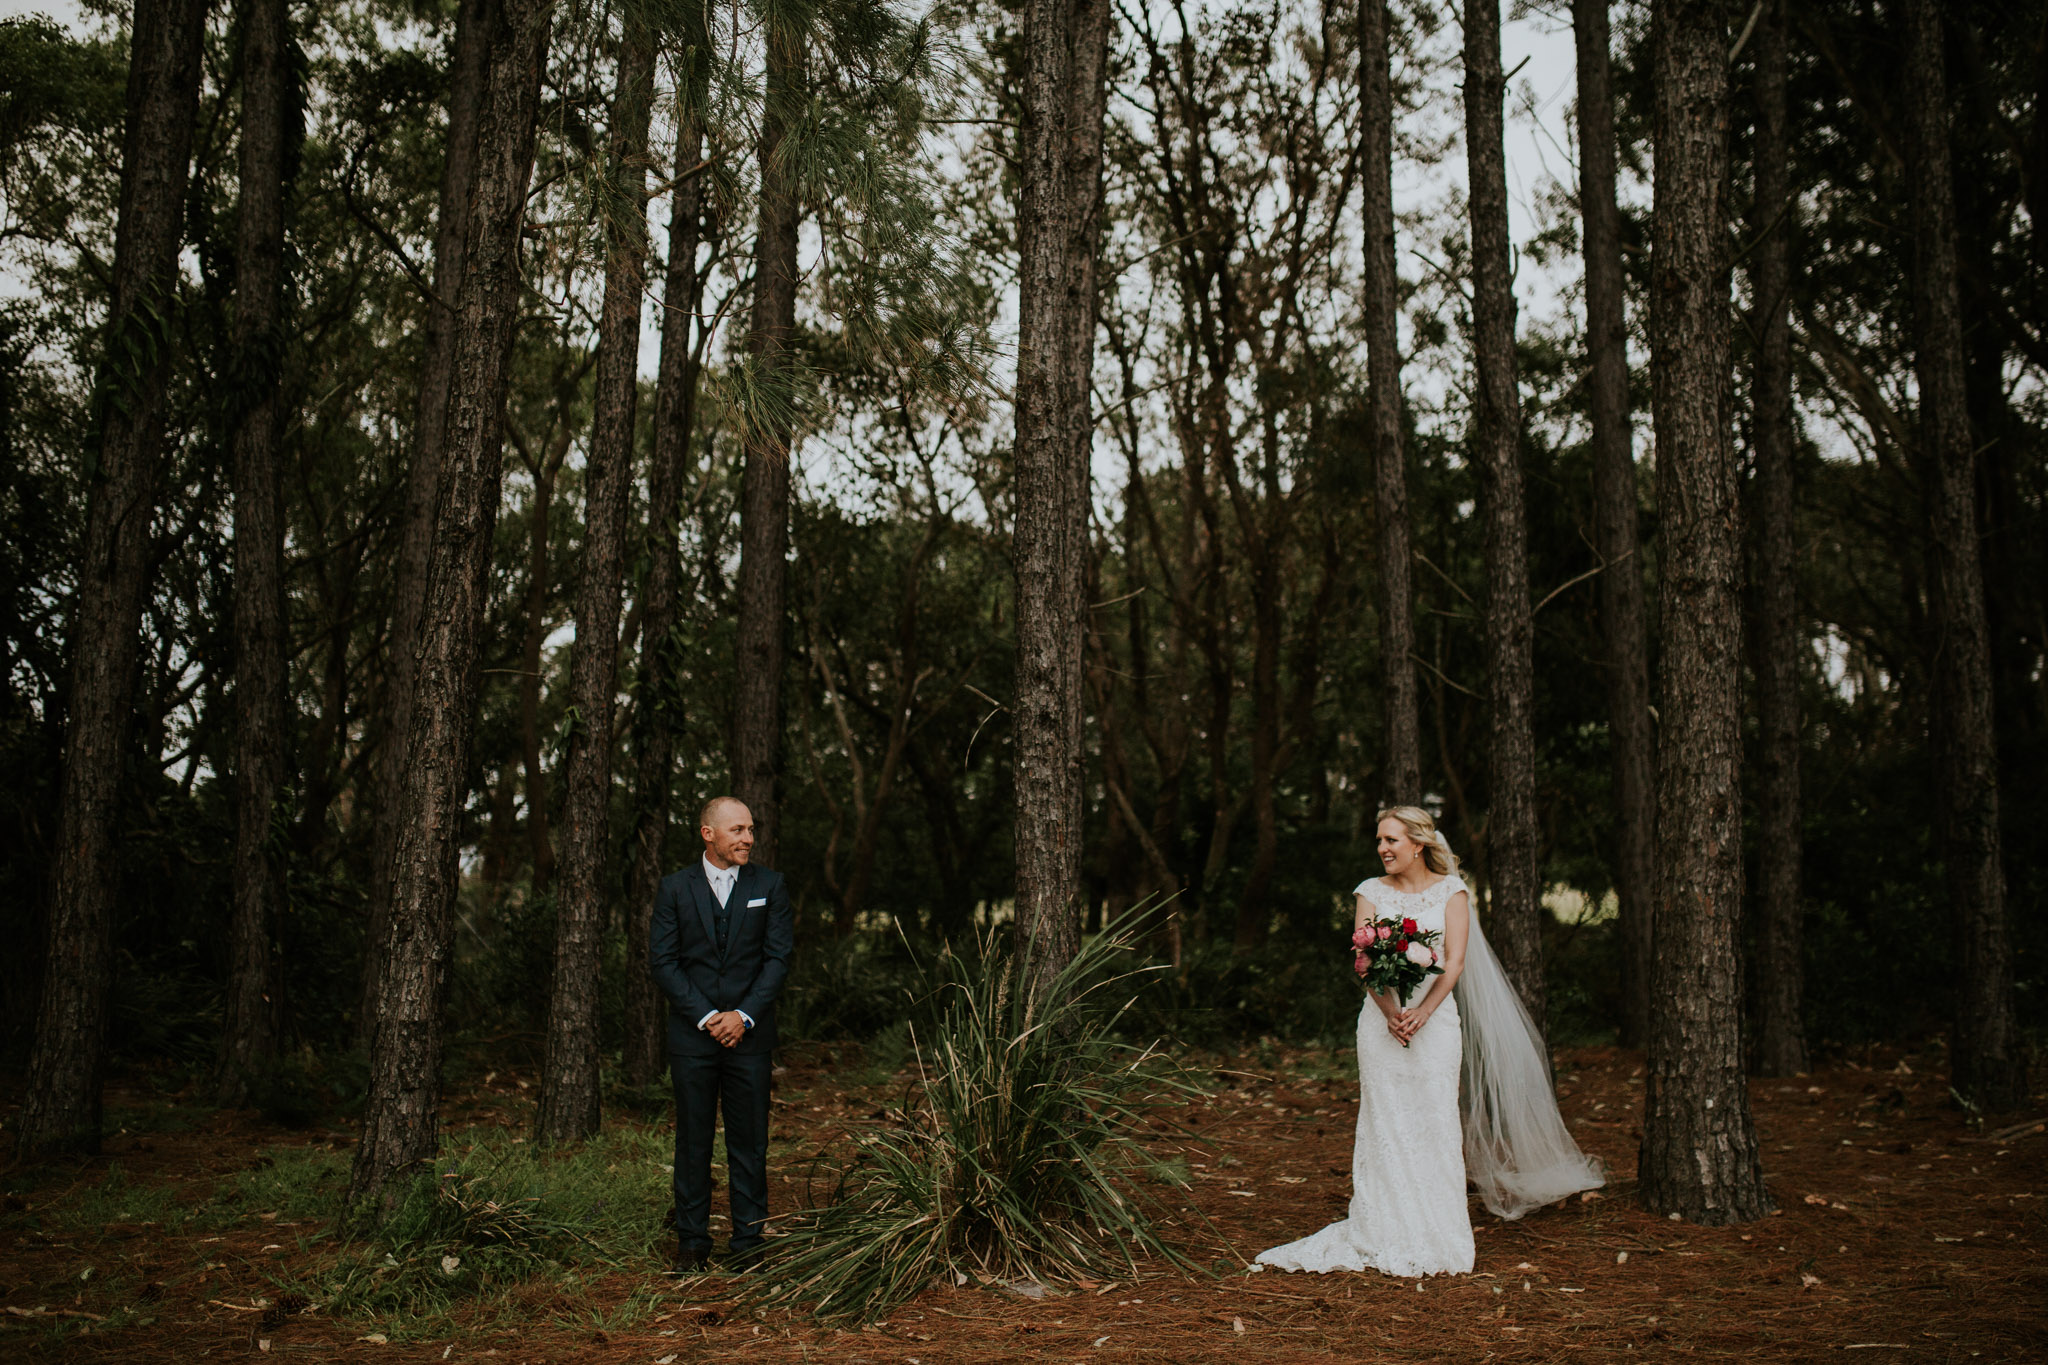 Shanan & Traci_Portkembla Golf Course Wedding-71.jpg